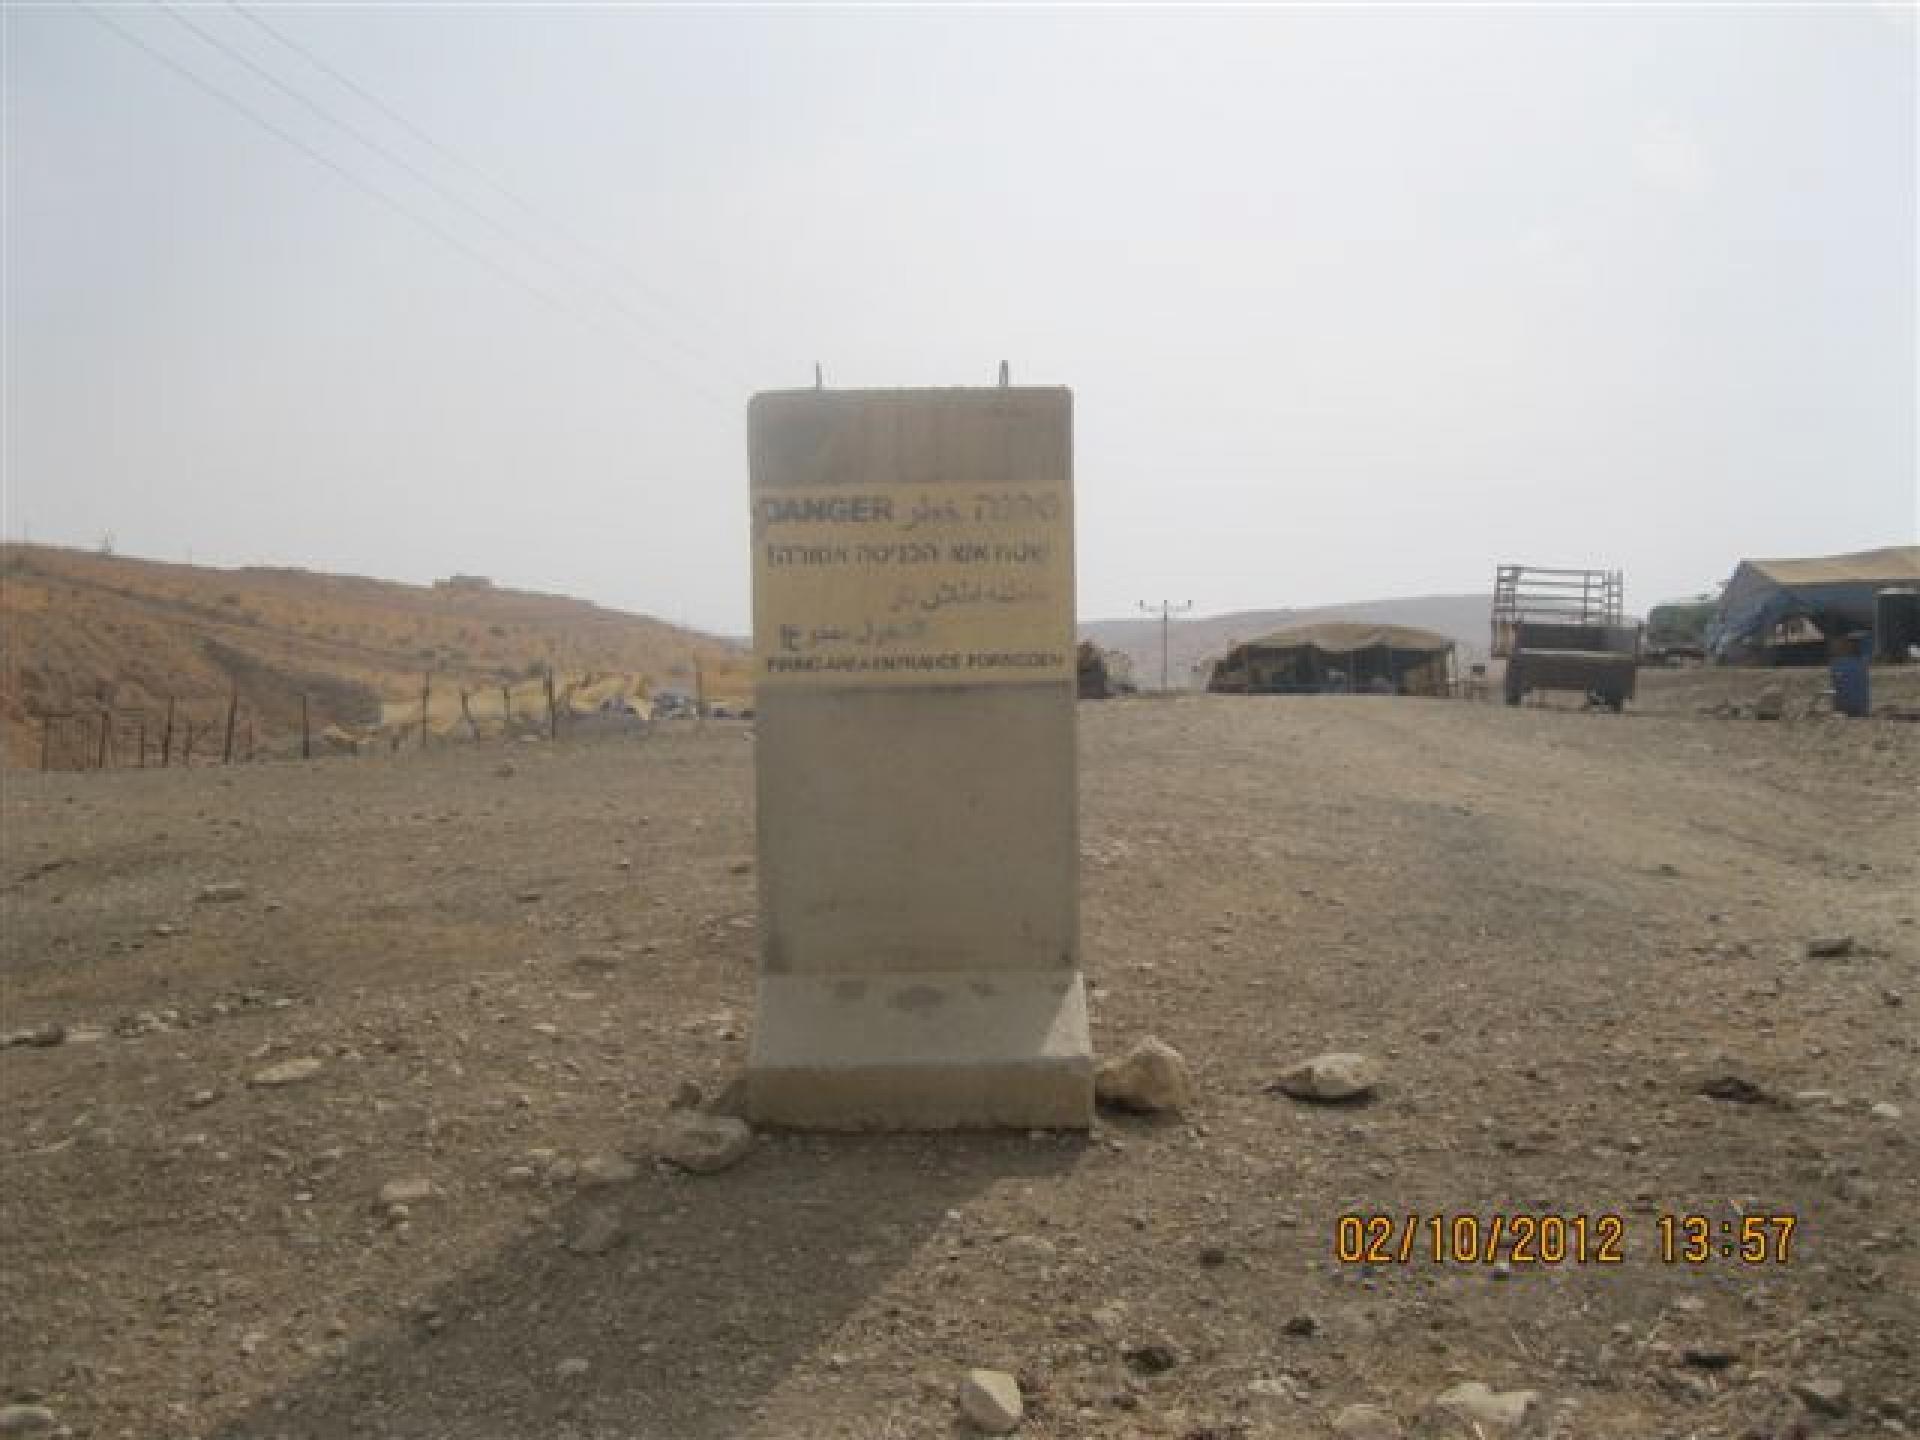 Jordan valley, Alon road/route 578 02.10.12